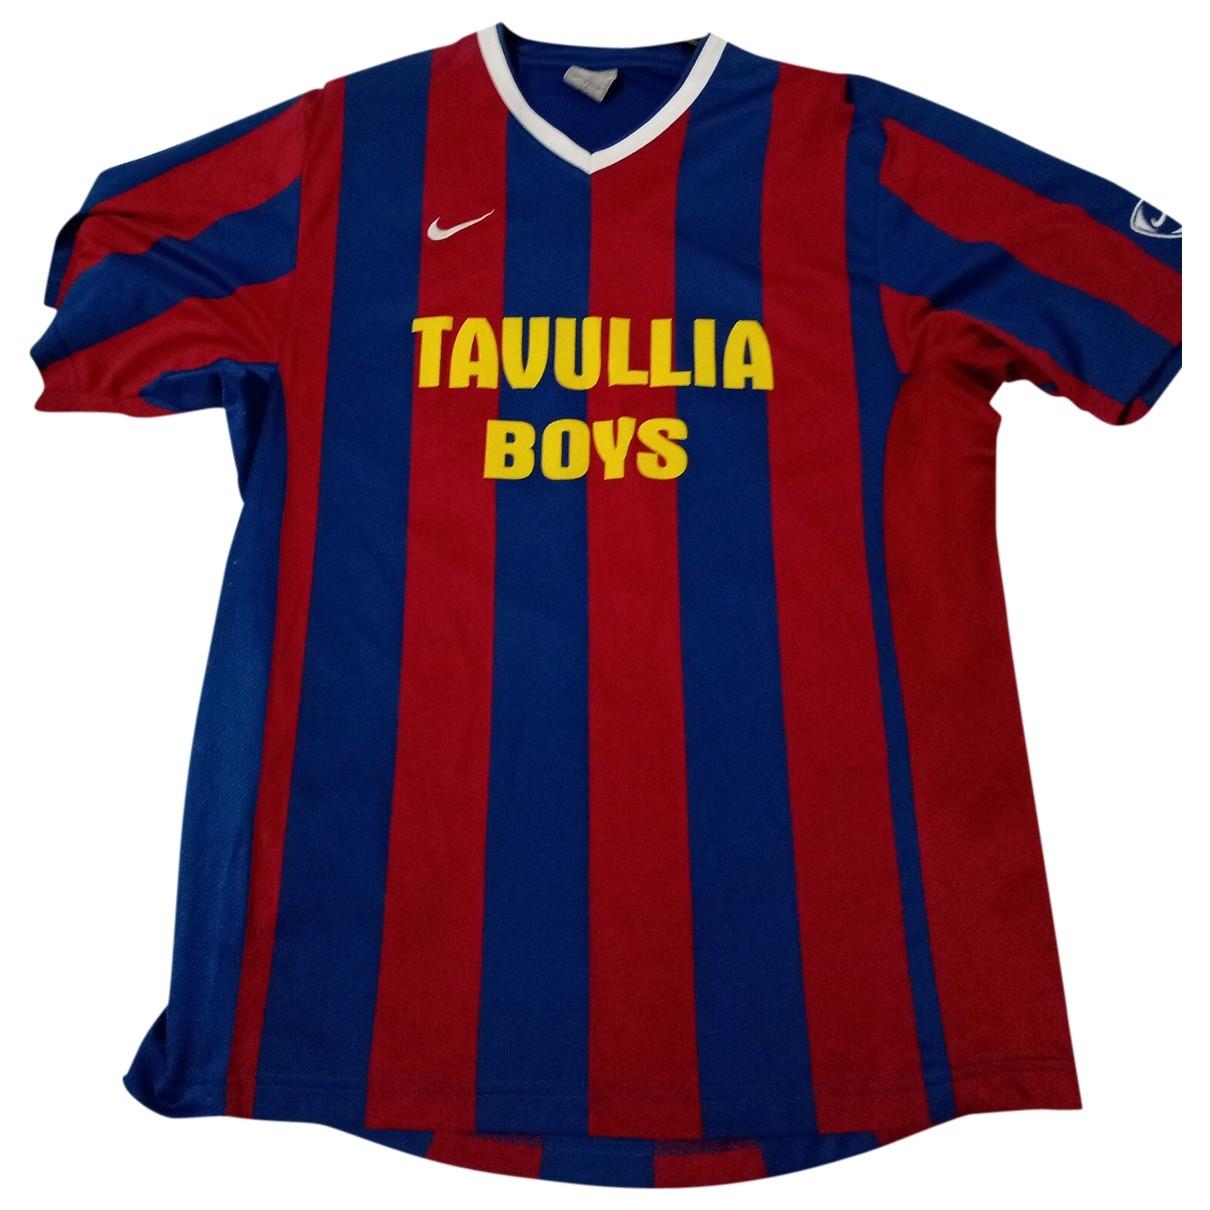 Nike \N T-shirts for Men L International